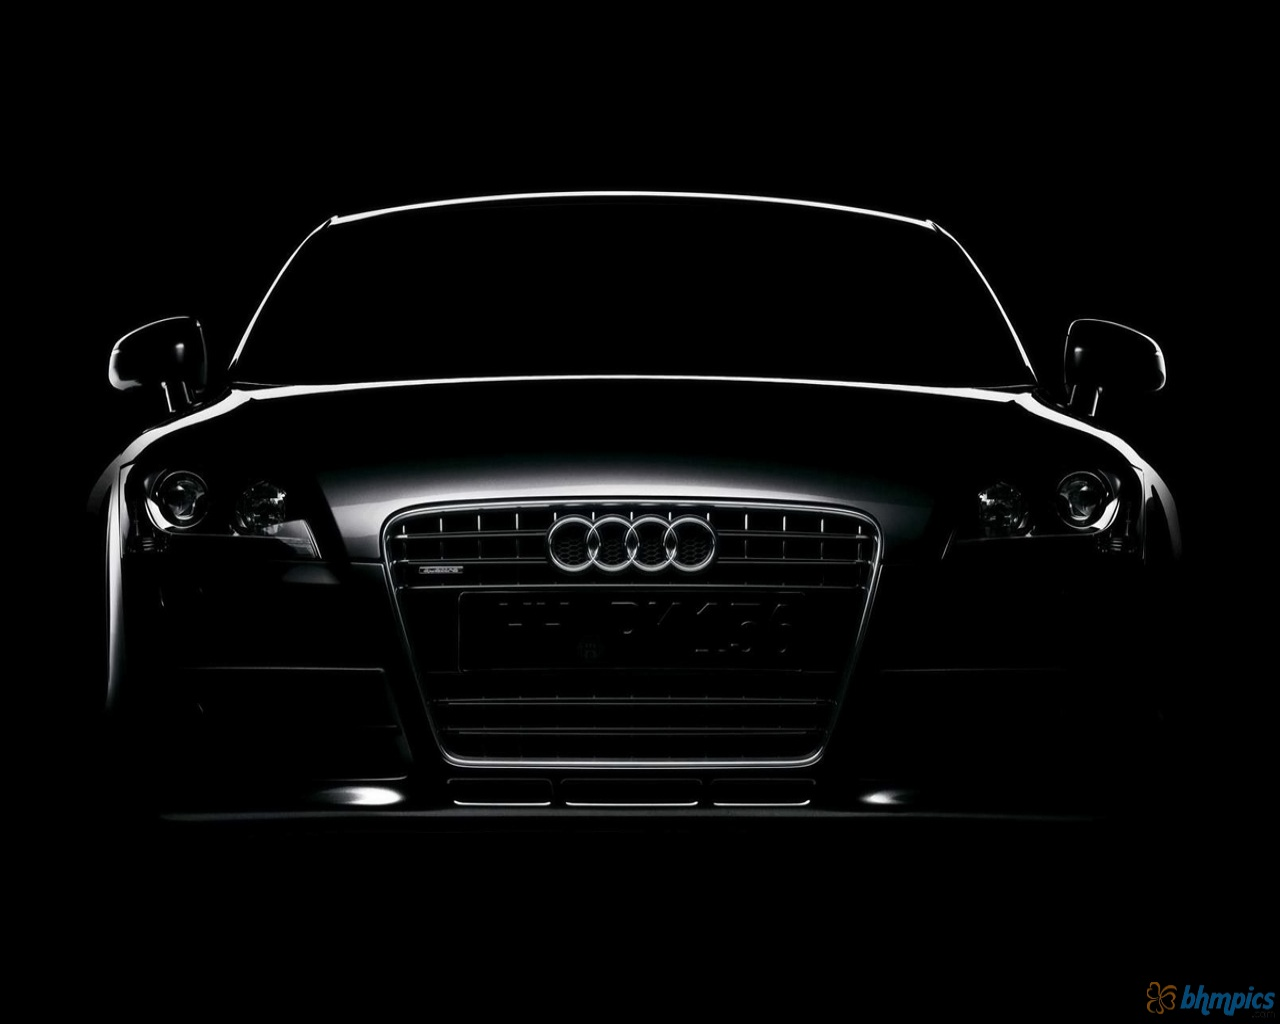 Audi Wallpaper Black 6413 Hd Wallpapers in Cars   Imagescicom 1280x1024